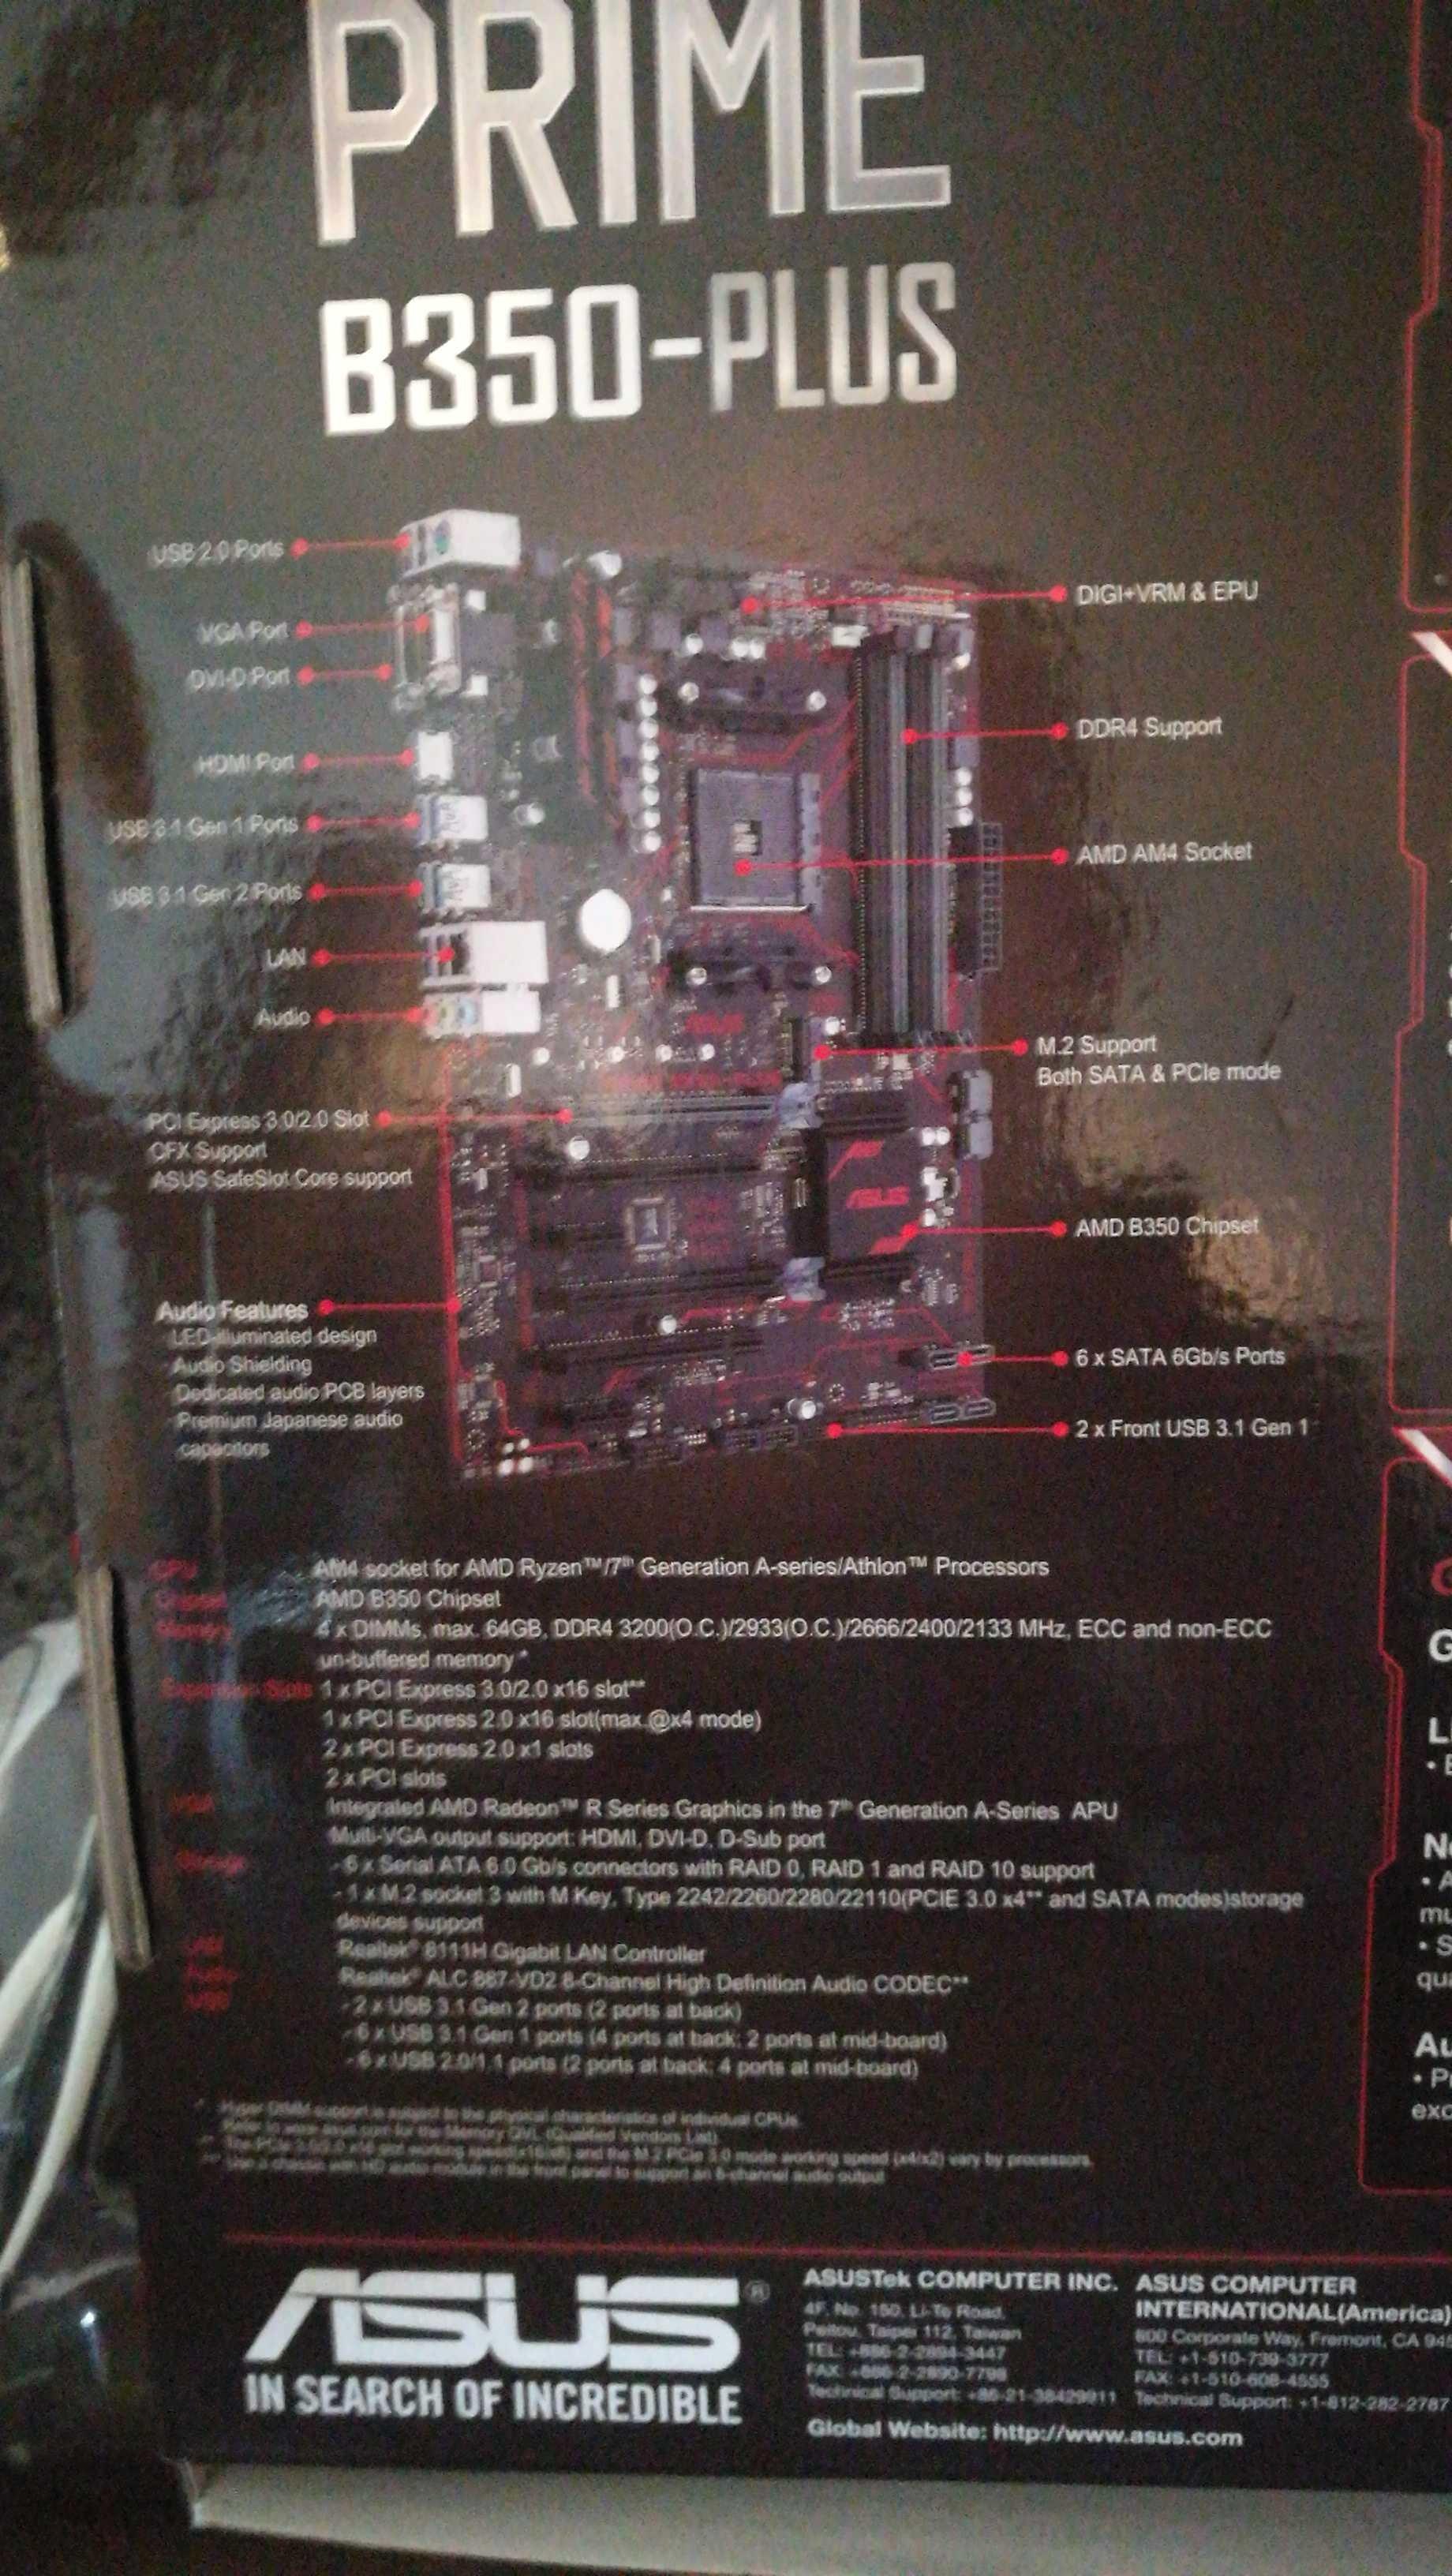 1f2280aa7bed1e9340e59e7bede4075e - Asus prime b350 plus bootet nicht